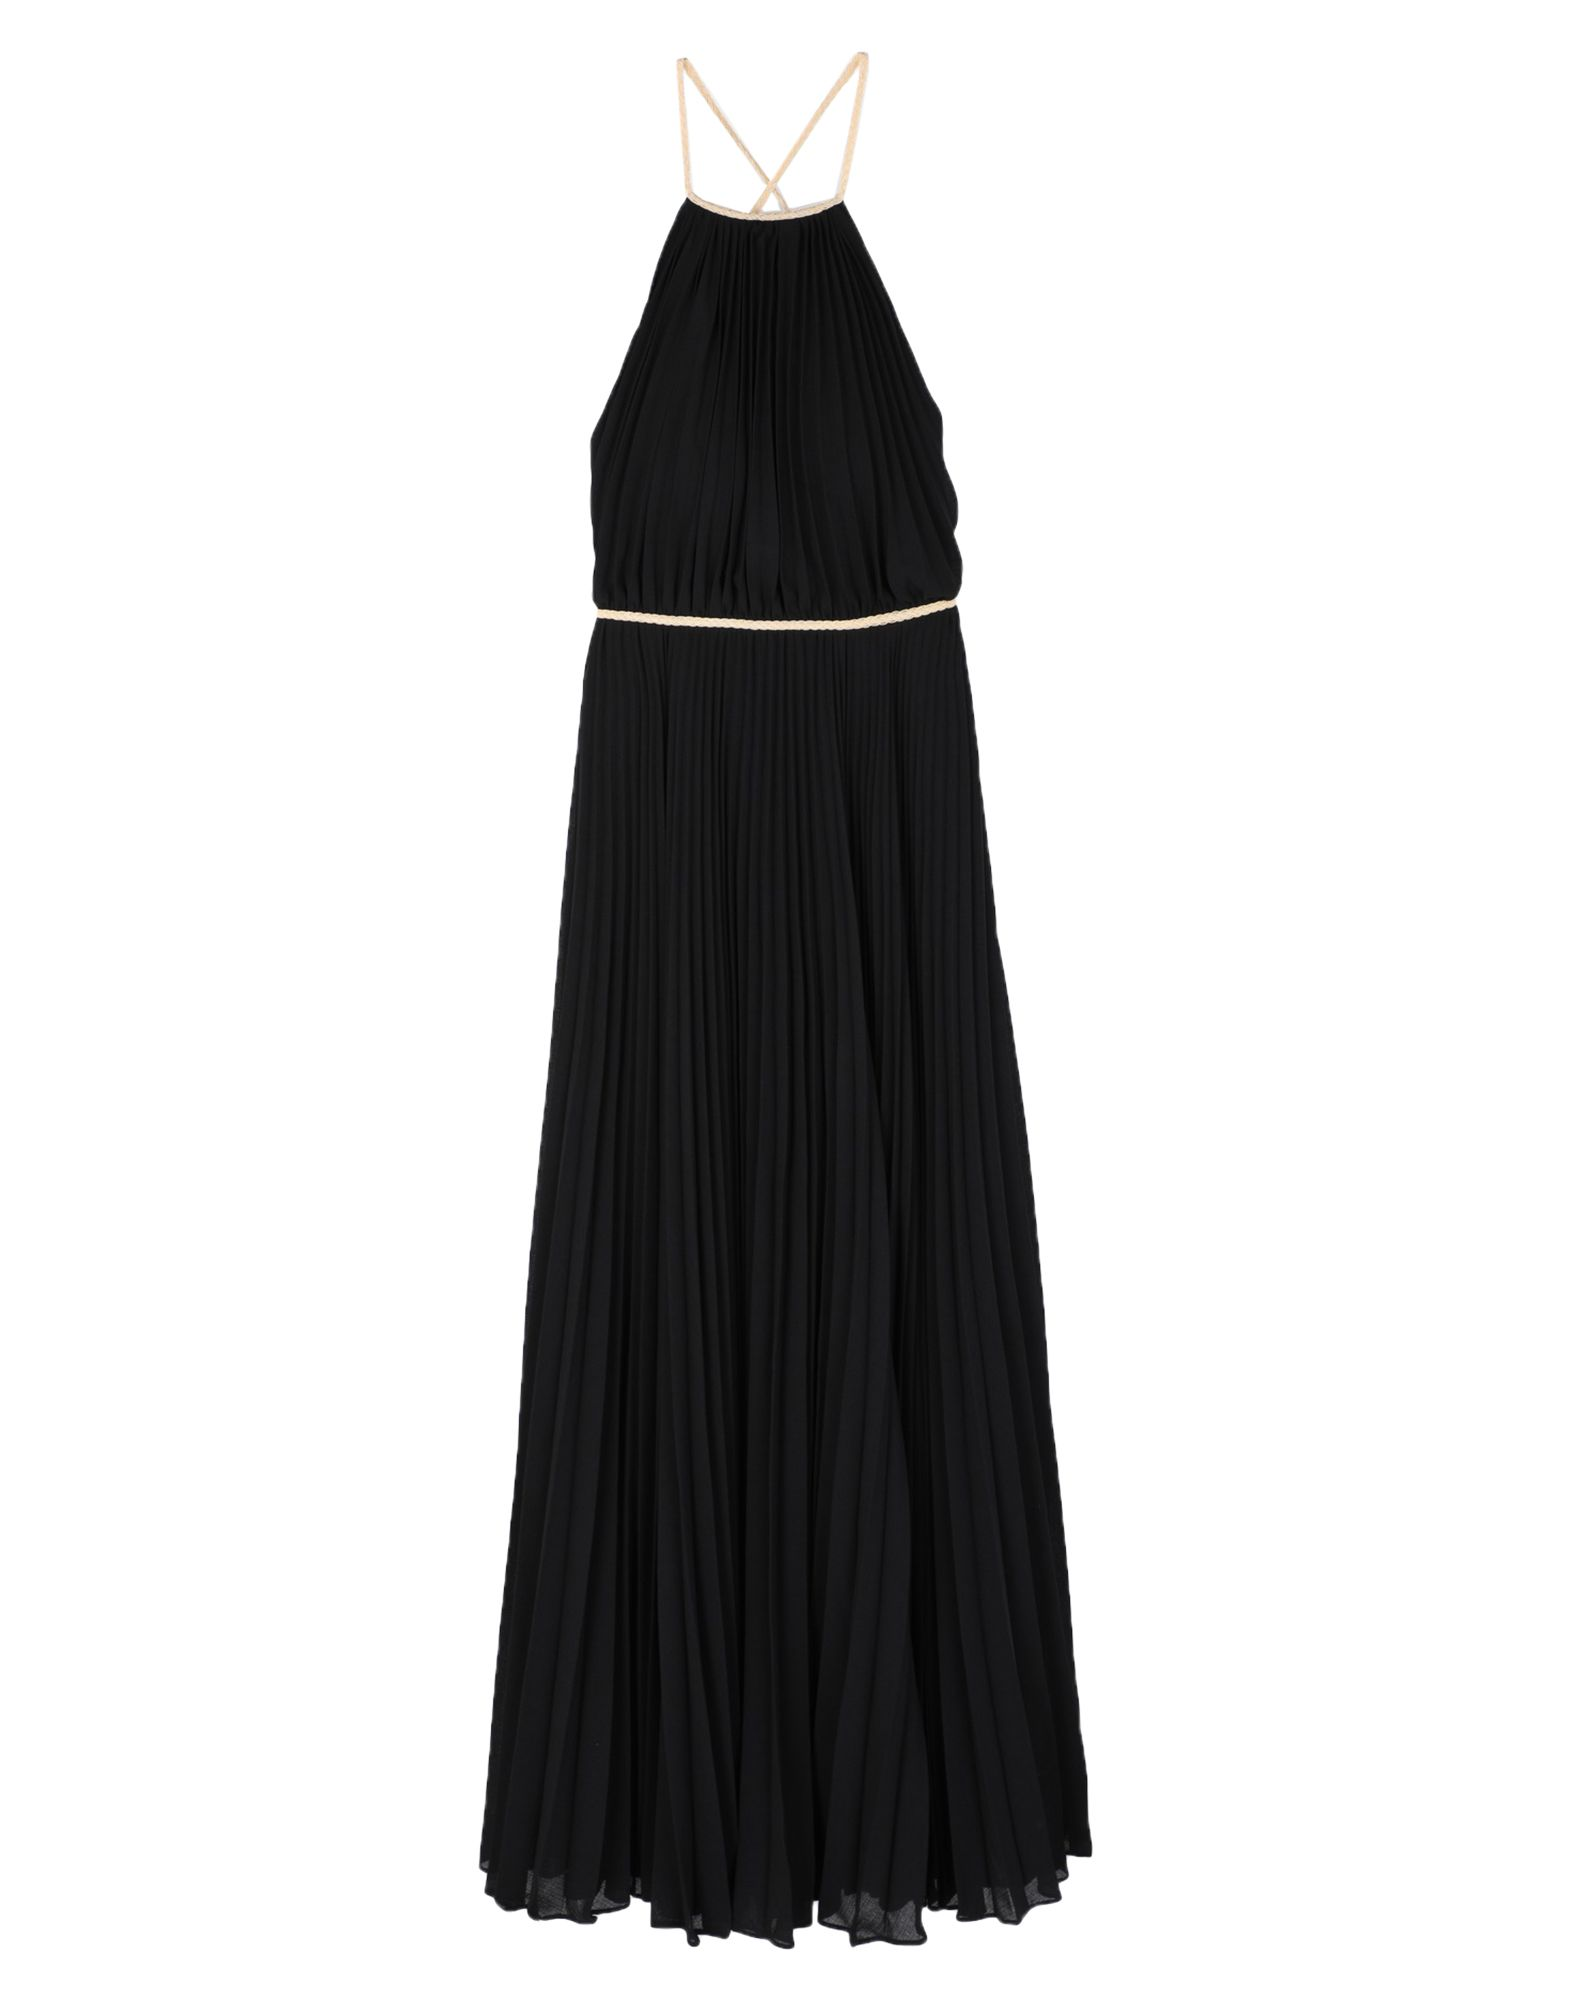 TWINS BEACH COUTURE Длинное платье